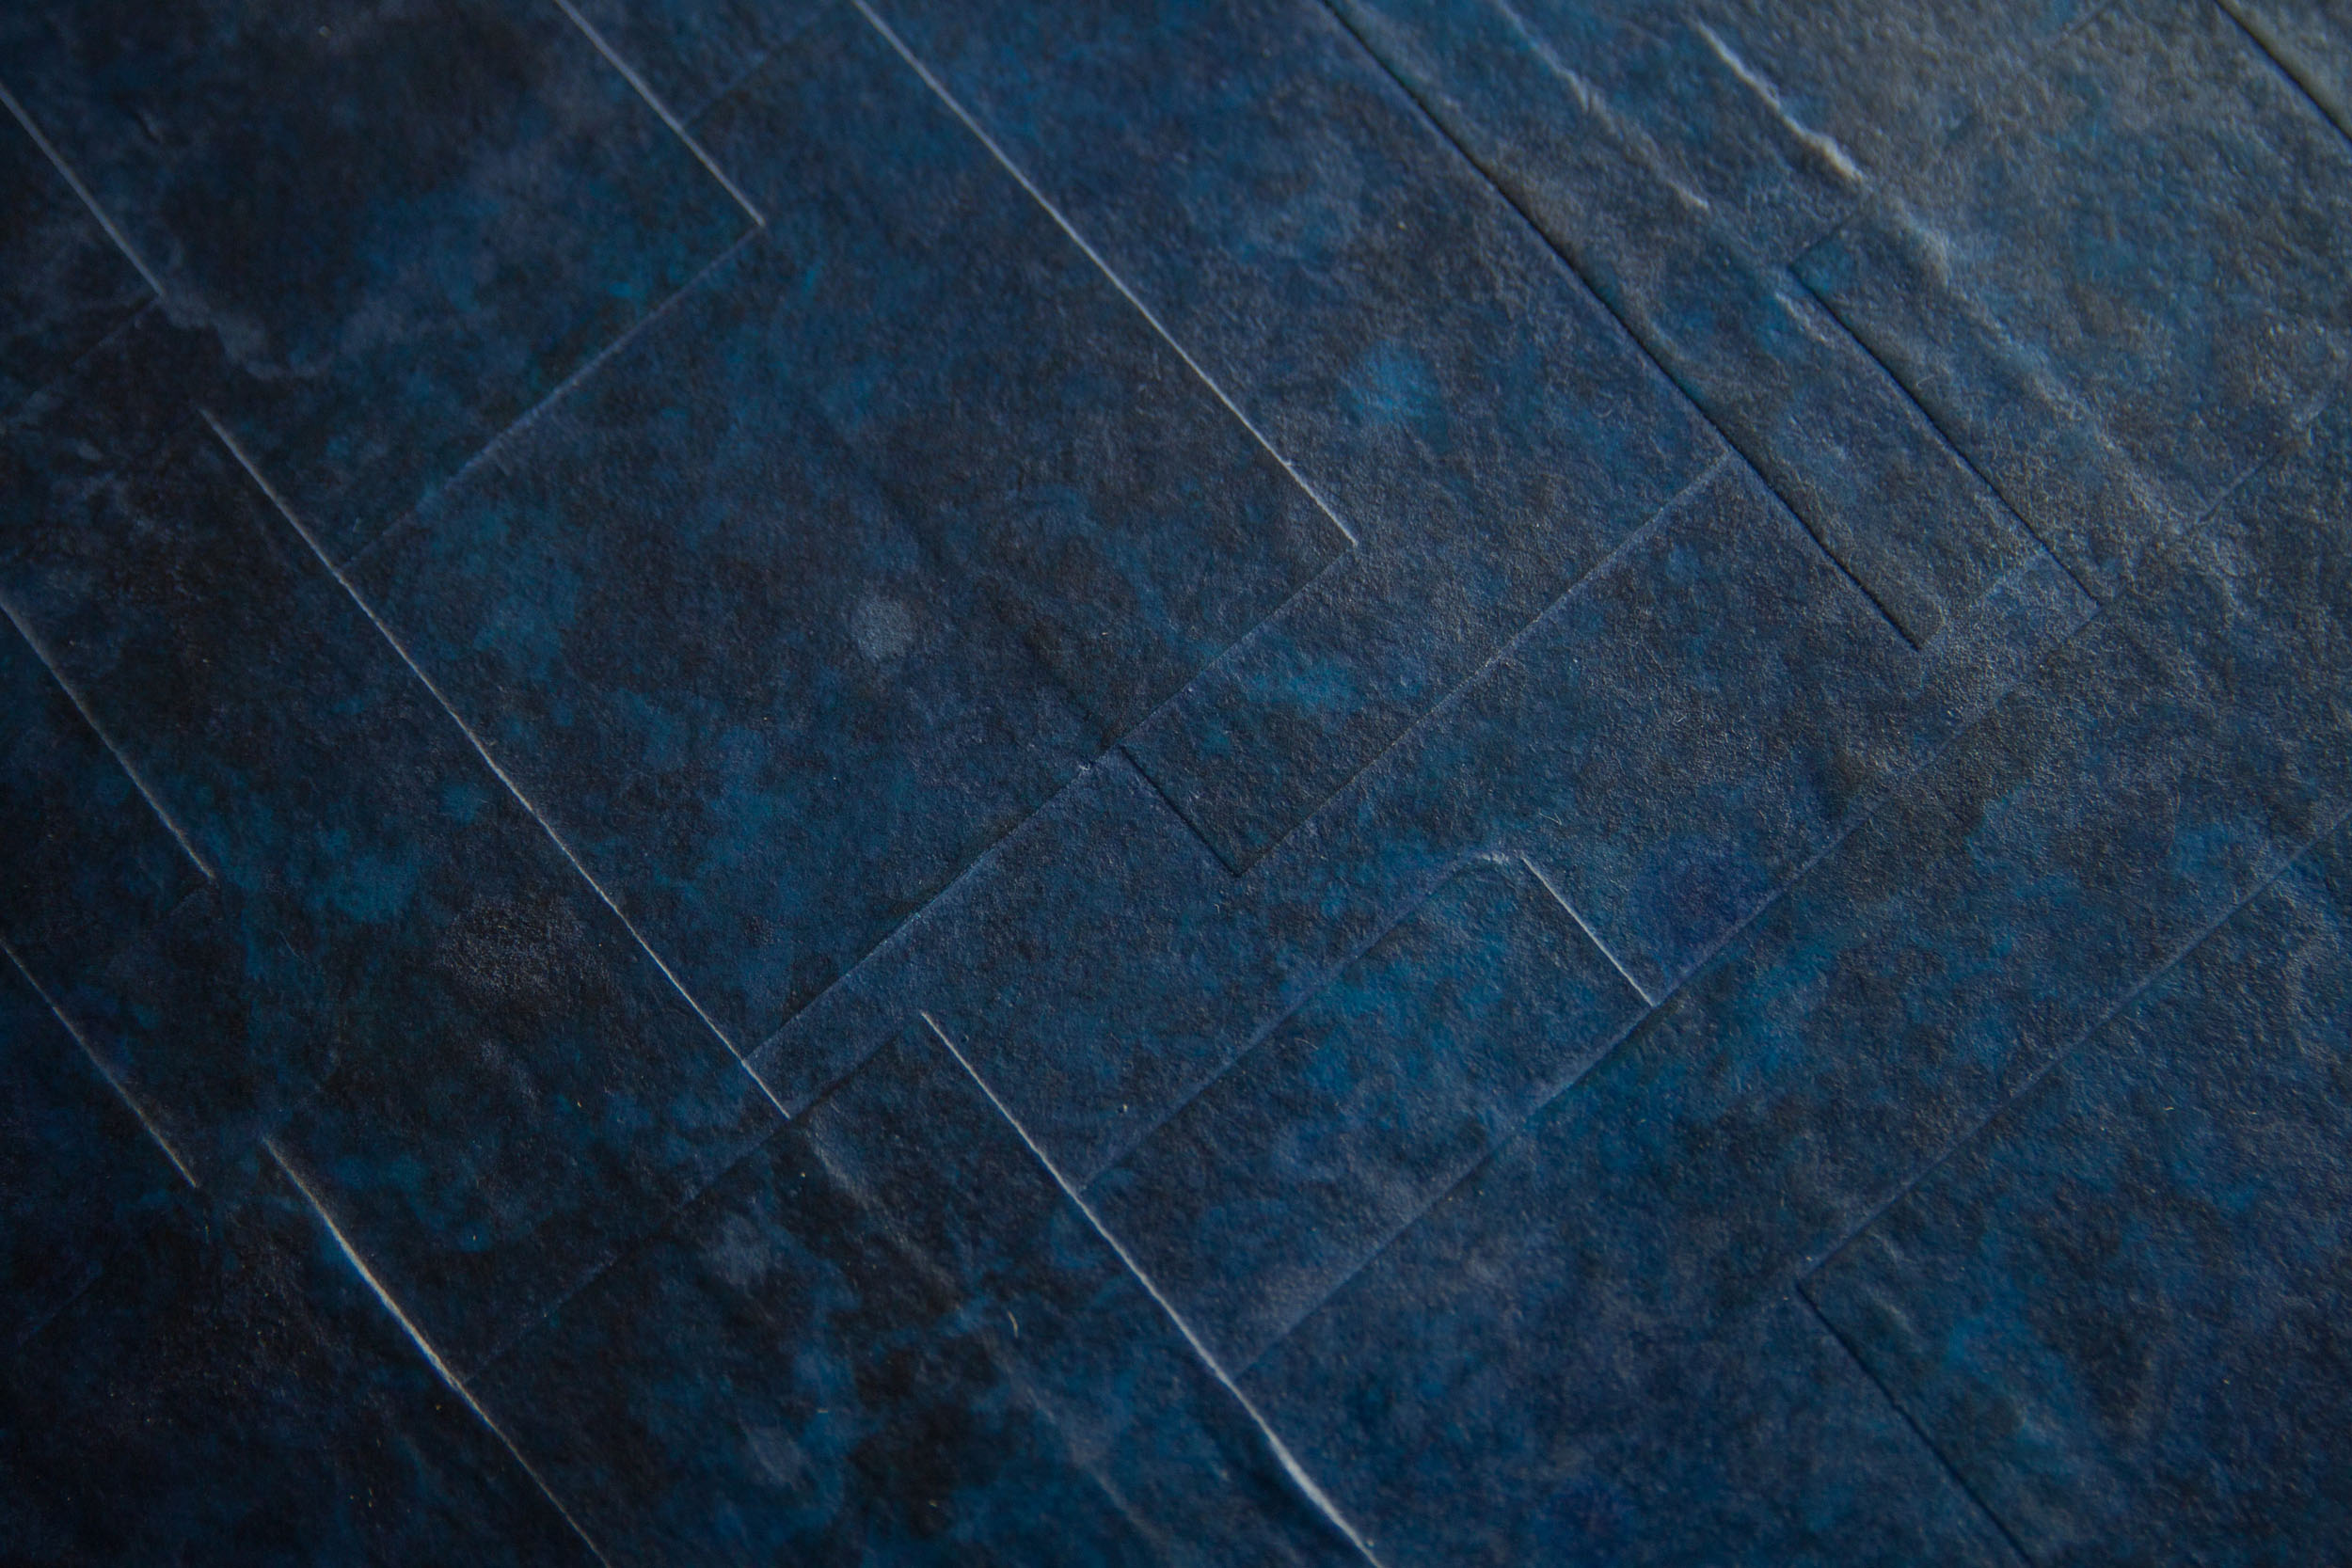 Detail of blue patina and cast gum paper bronze texture